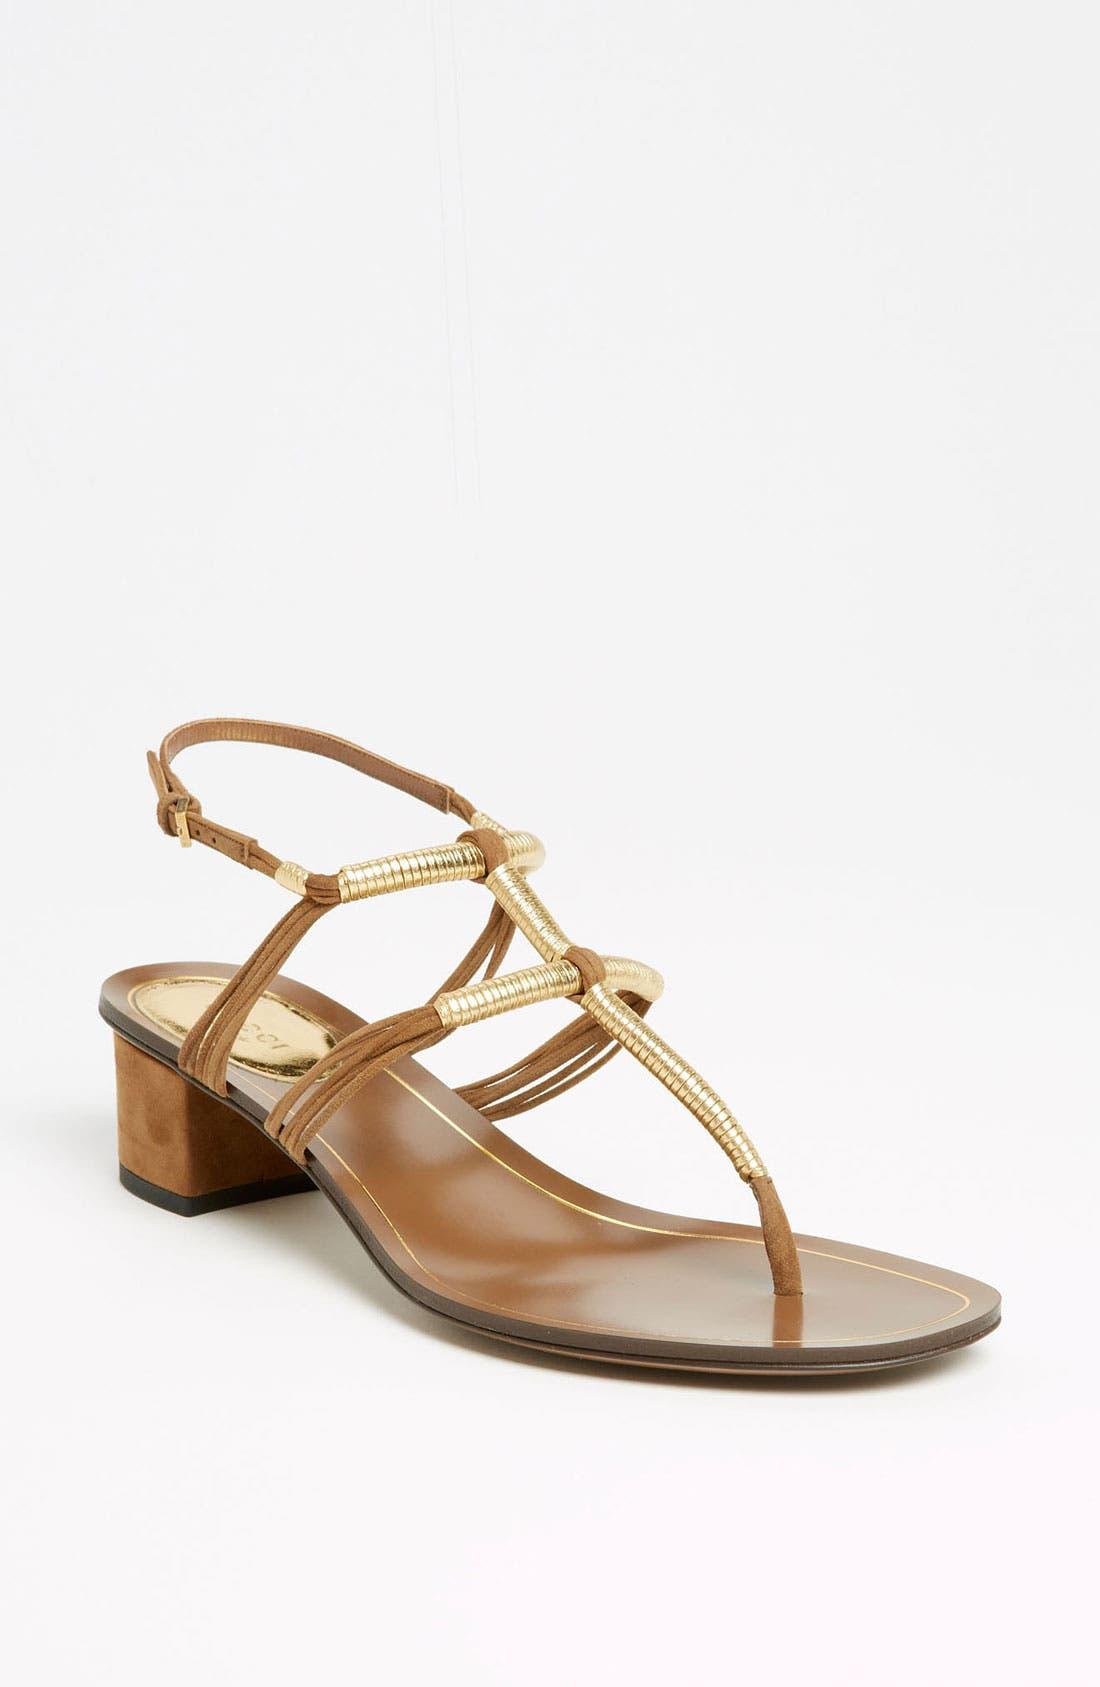 Main Image - Gucci 'Anita' Thong Sandal